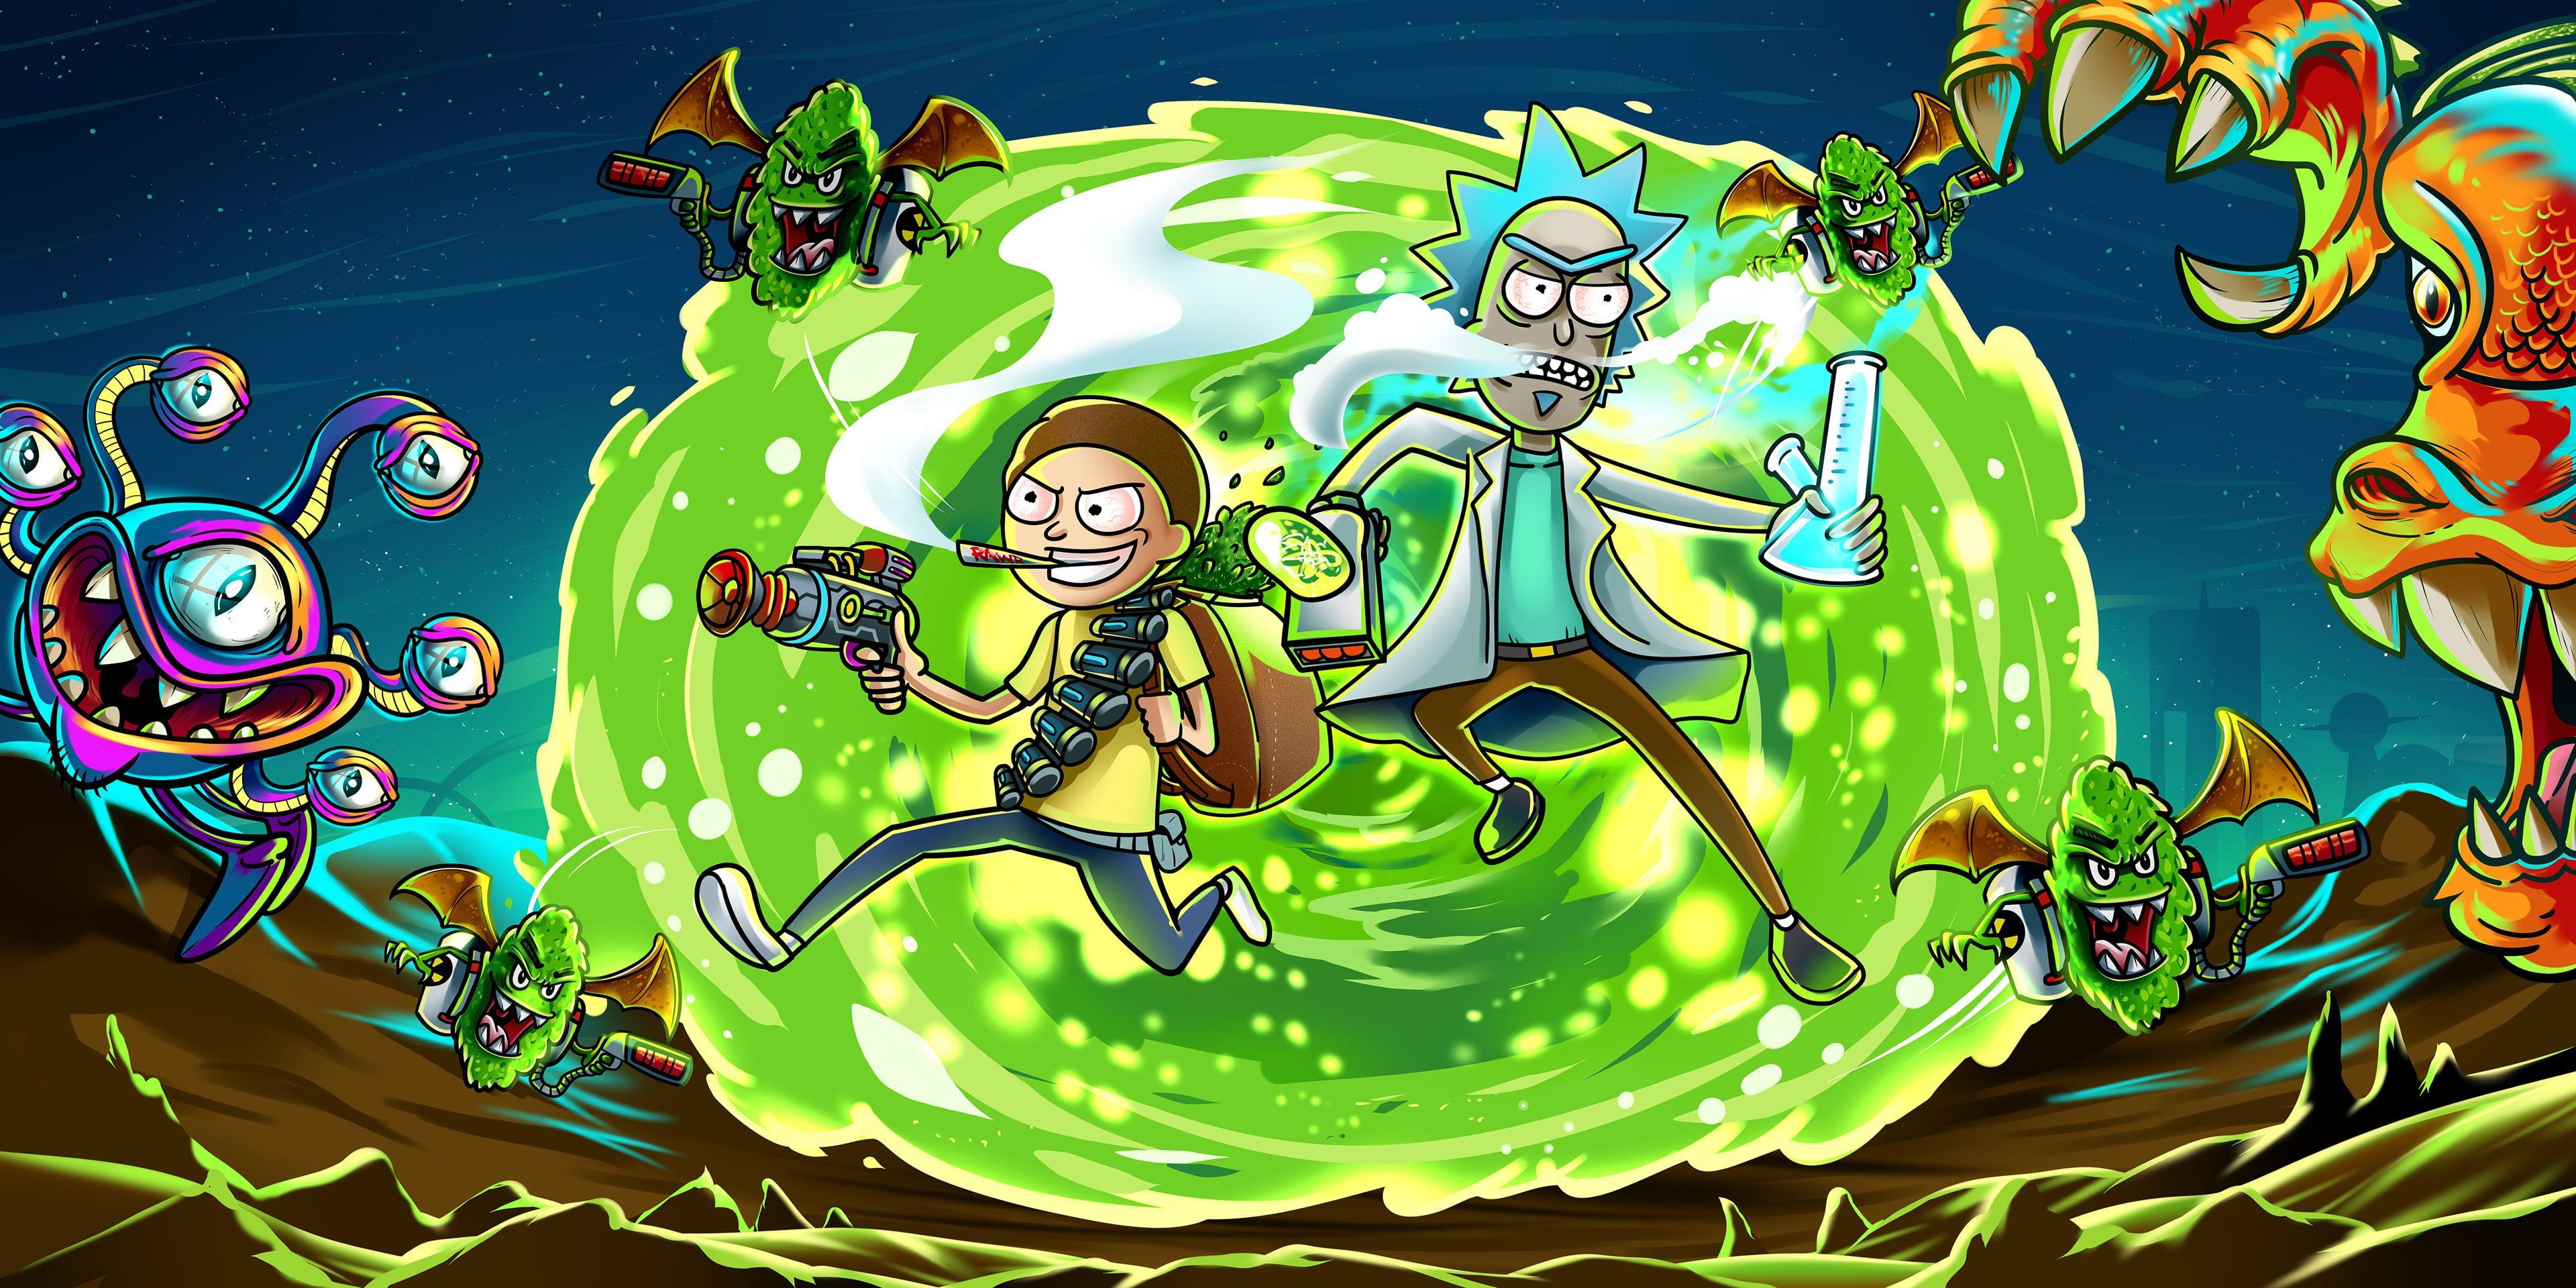 Rick And Morty Tv Shows Hd 4k Illustration Behance Artist Artwork Digital Art 4k Wallpaper Hdwallpa Rick And Morty Cartoon Wallpaper Samsung Wallpaper